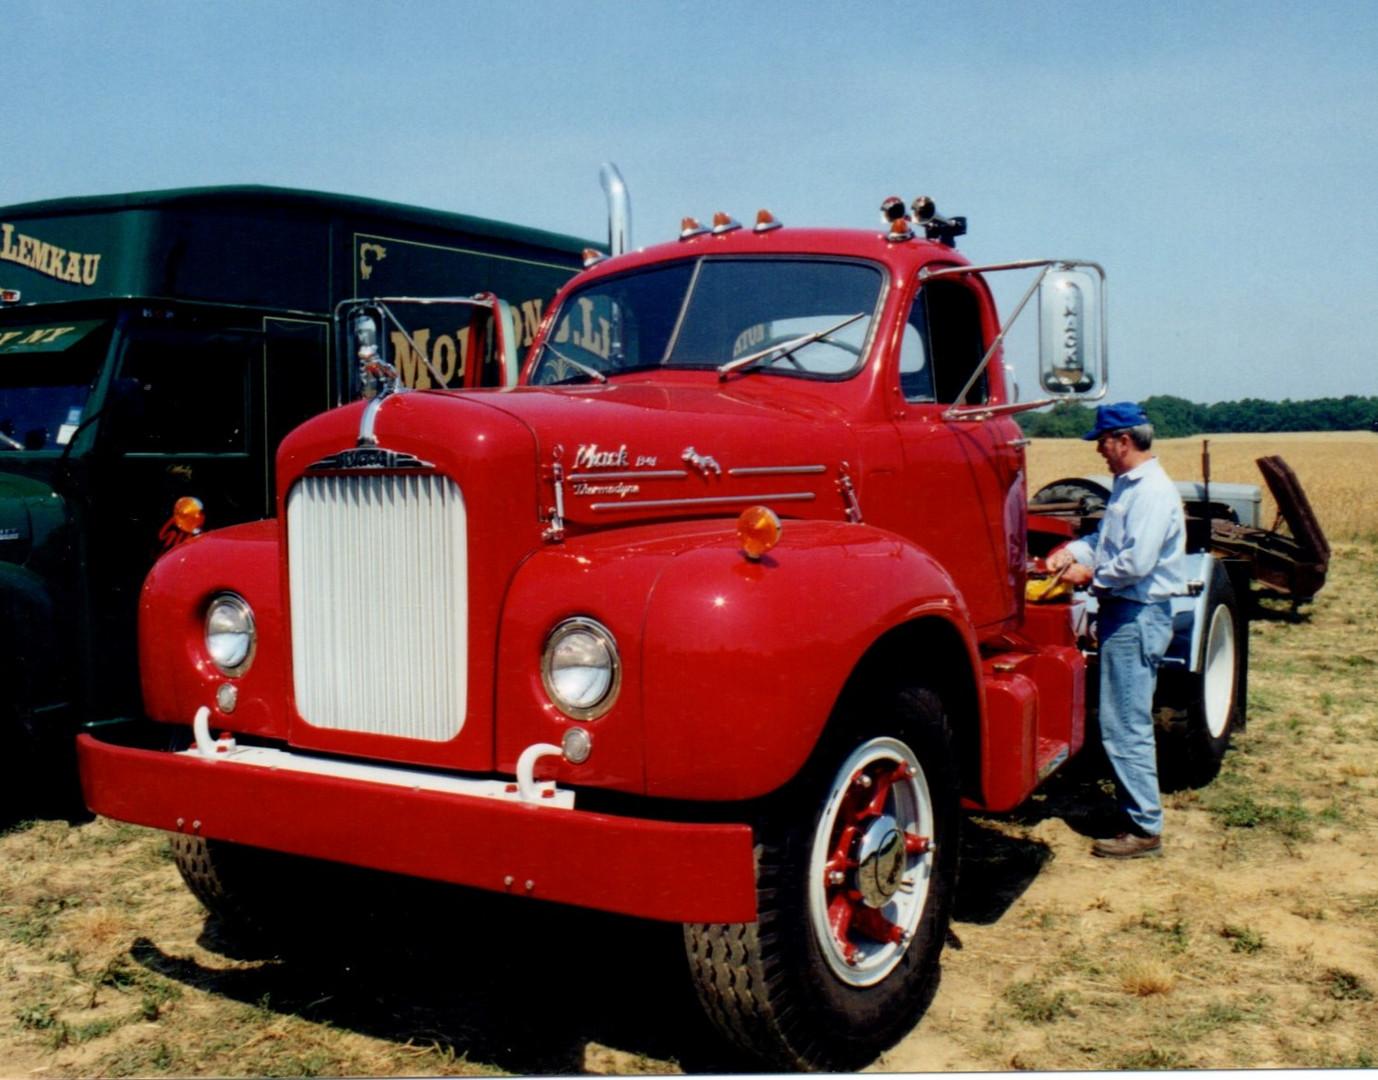 1957 Mack B-61 tractor